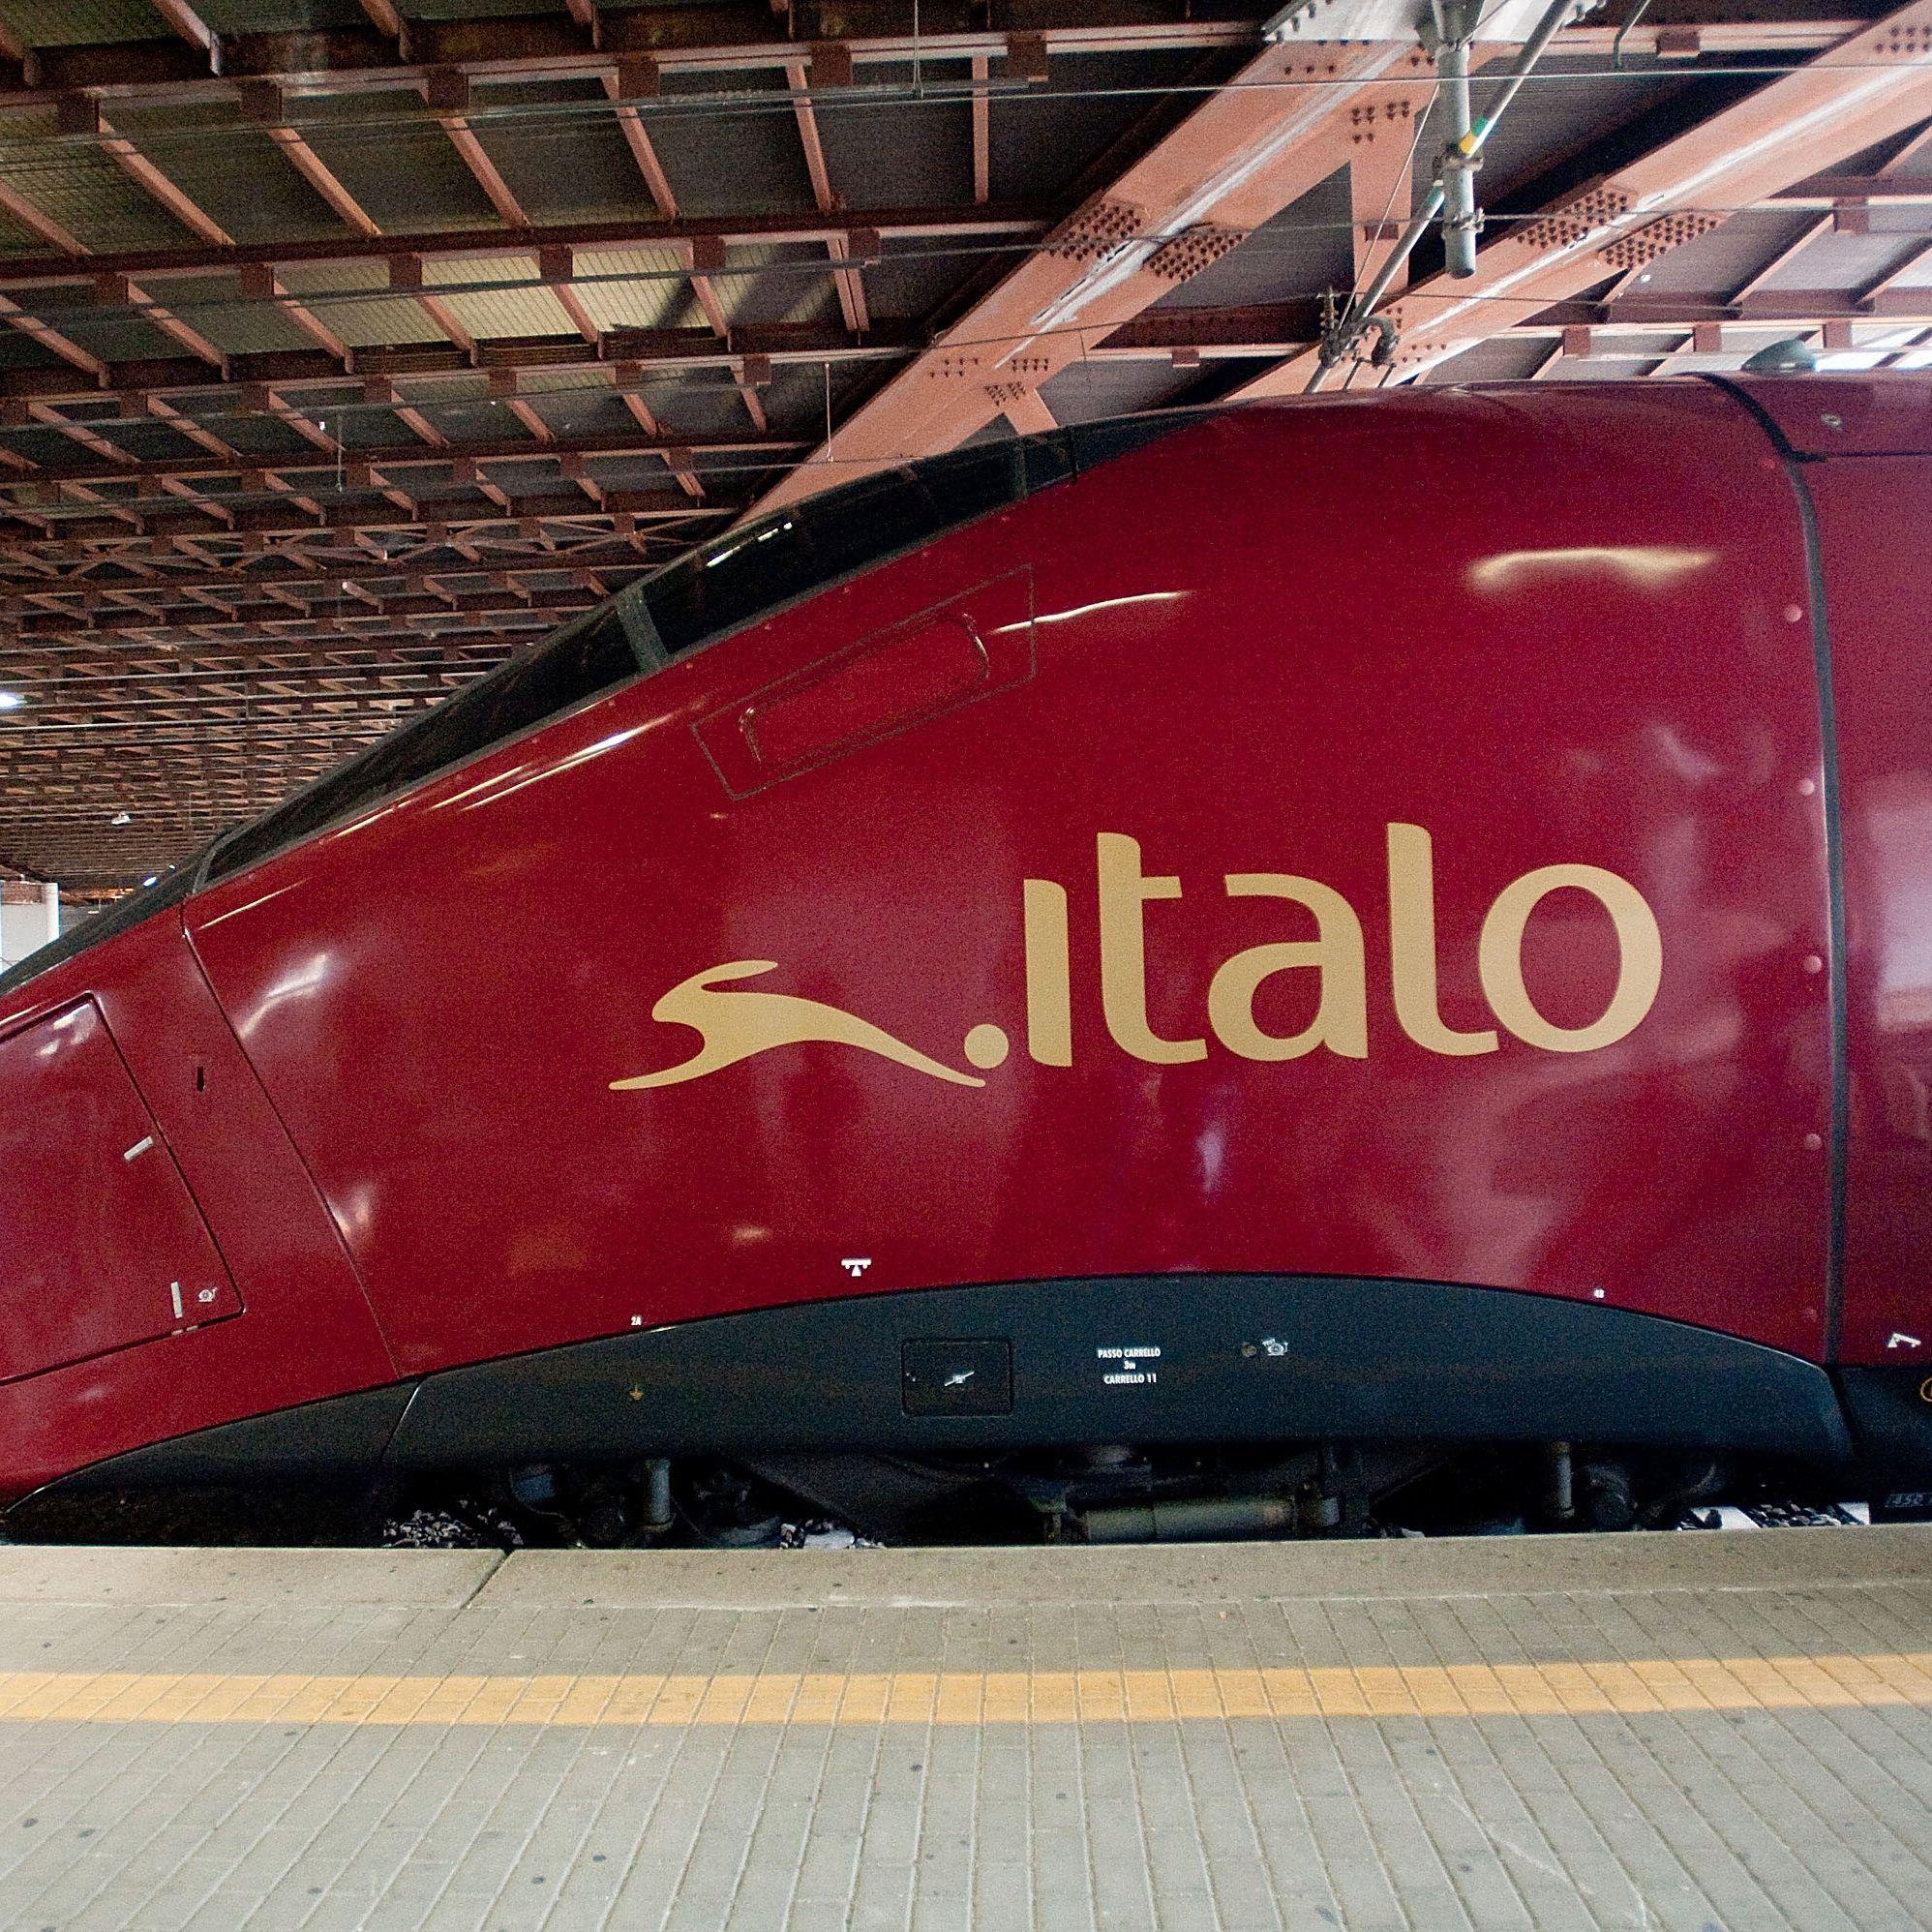 Wondrous Italys Private High Speed Rail Line Italo Beatyapartments Chair Design Images Beatyapartmentscom